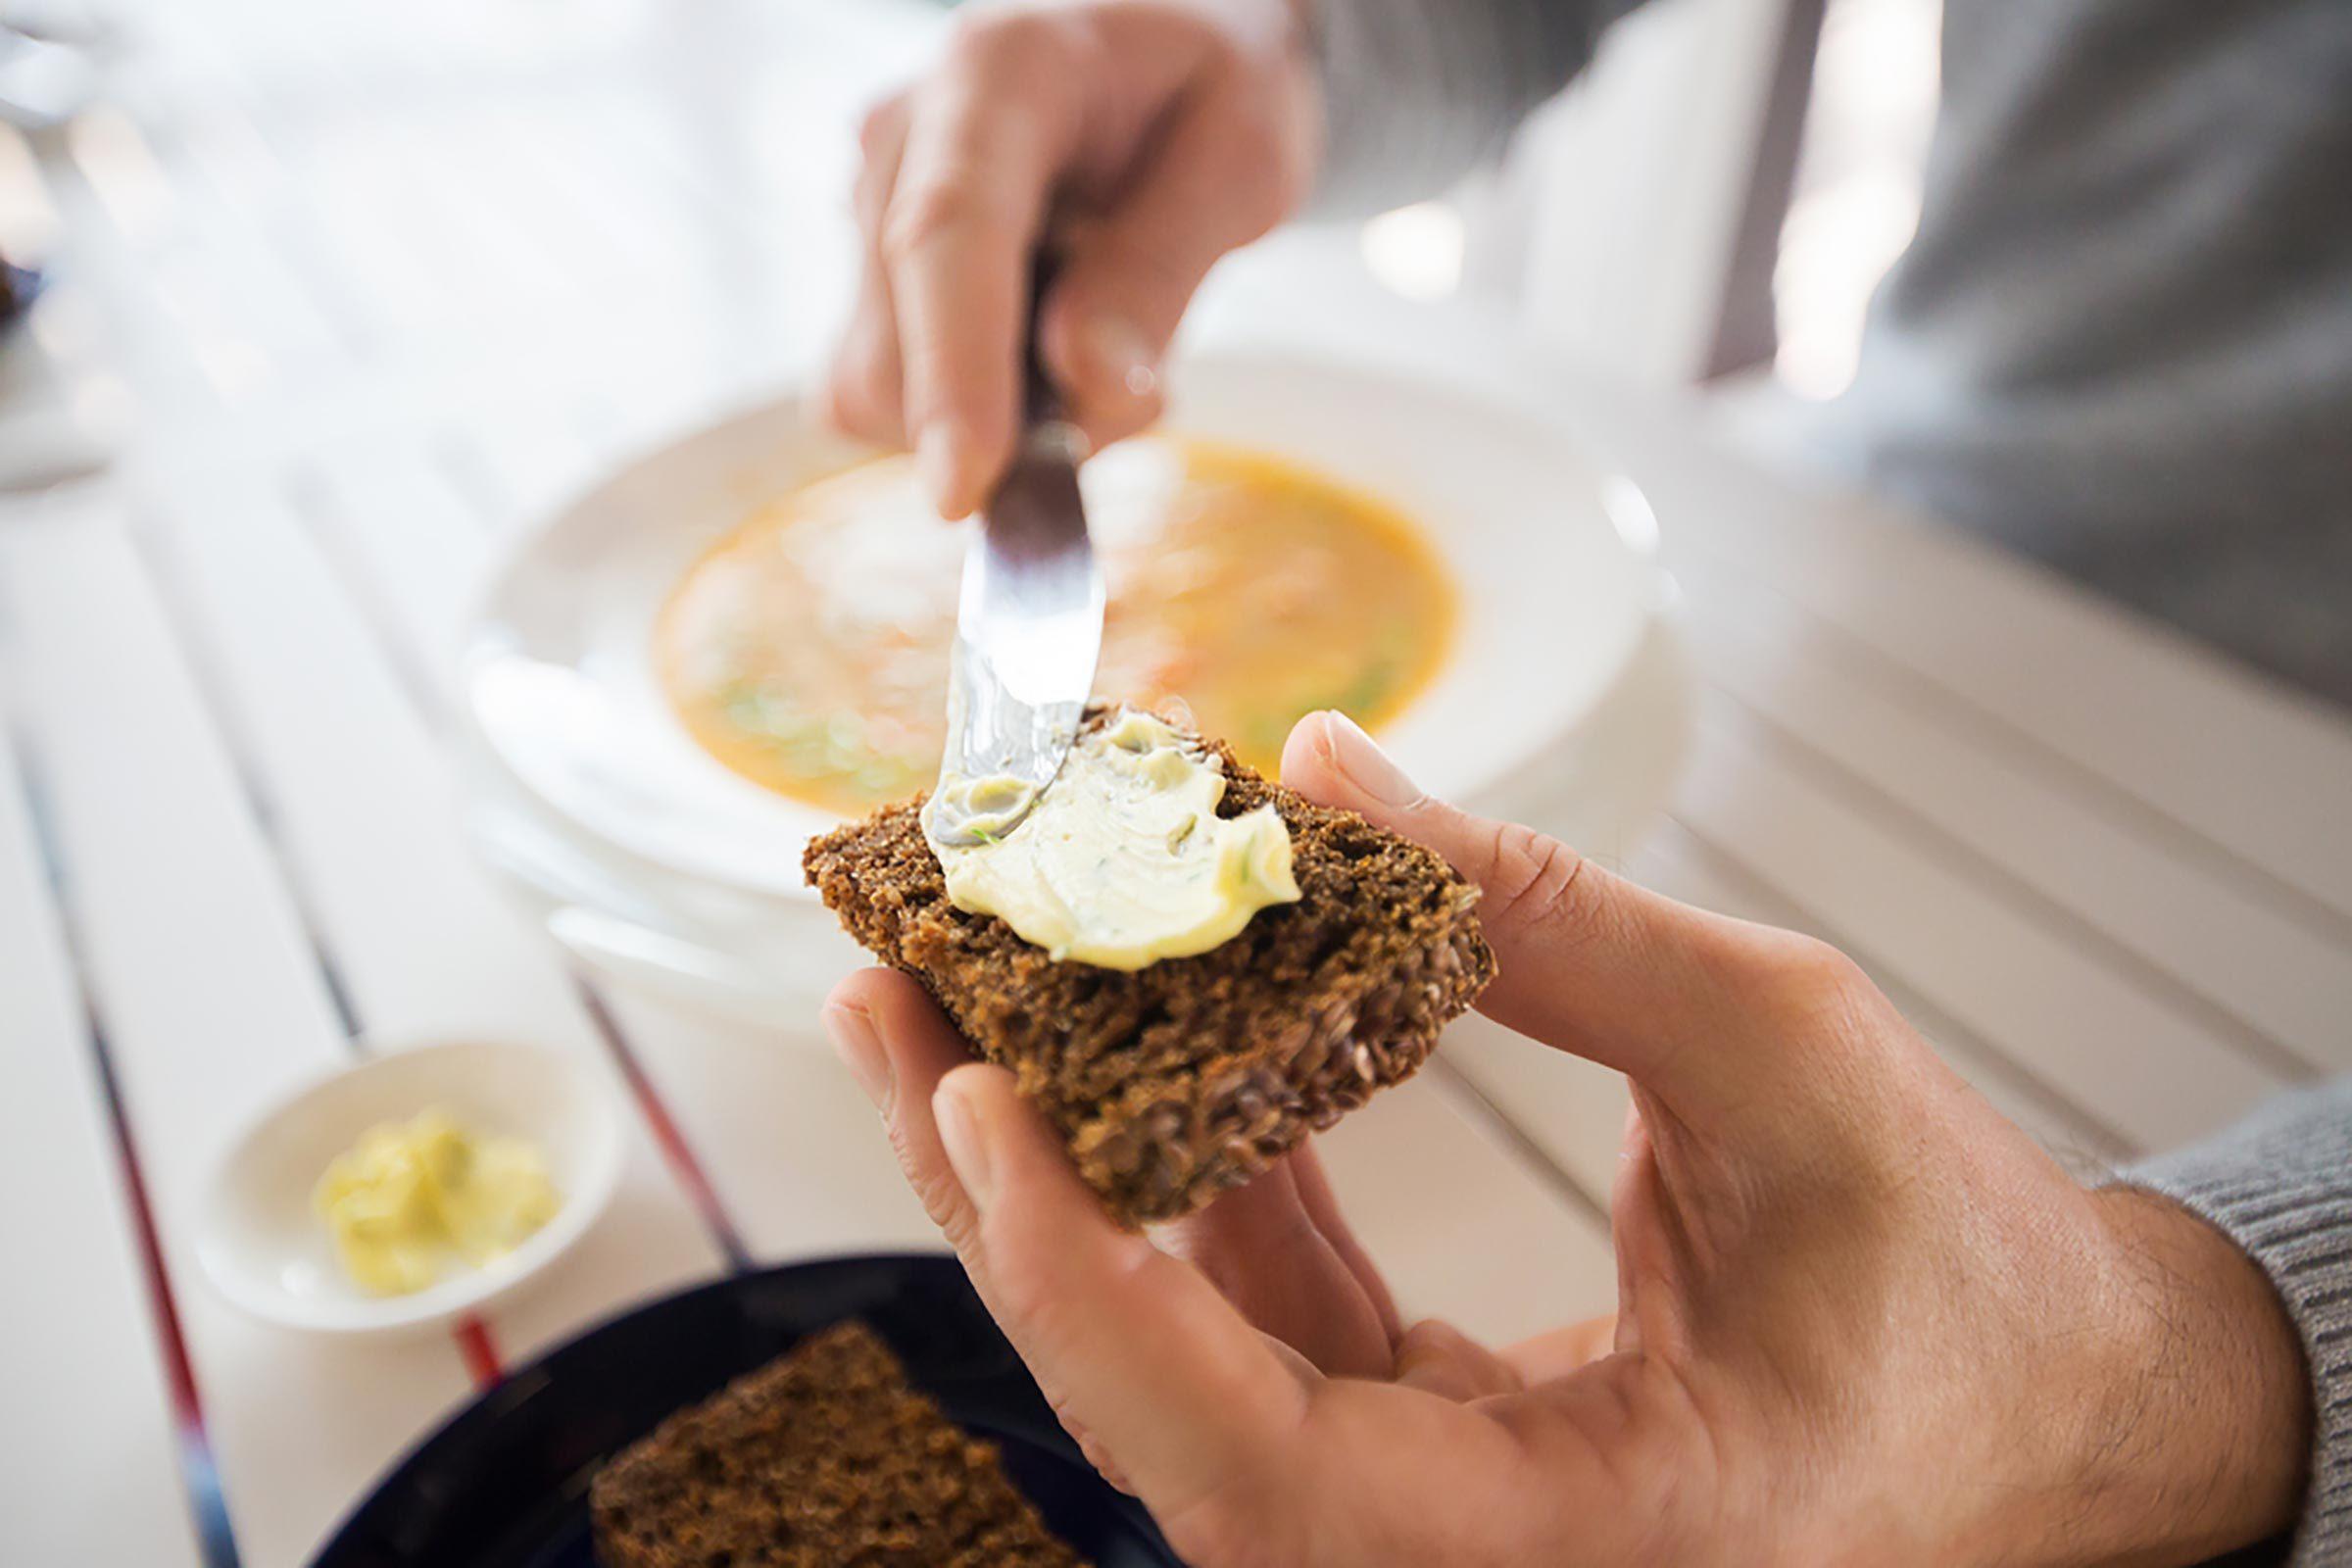 Man putting margarine on toast